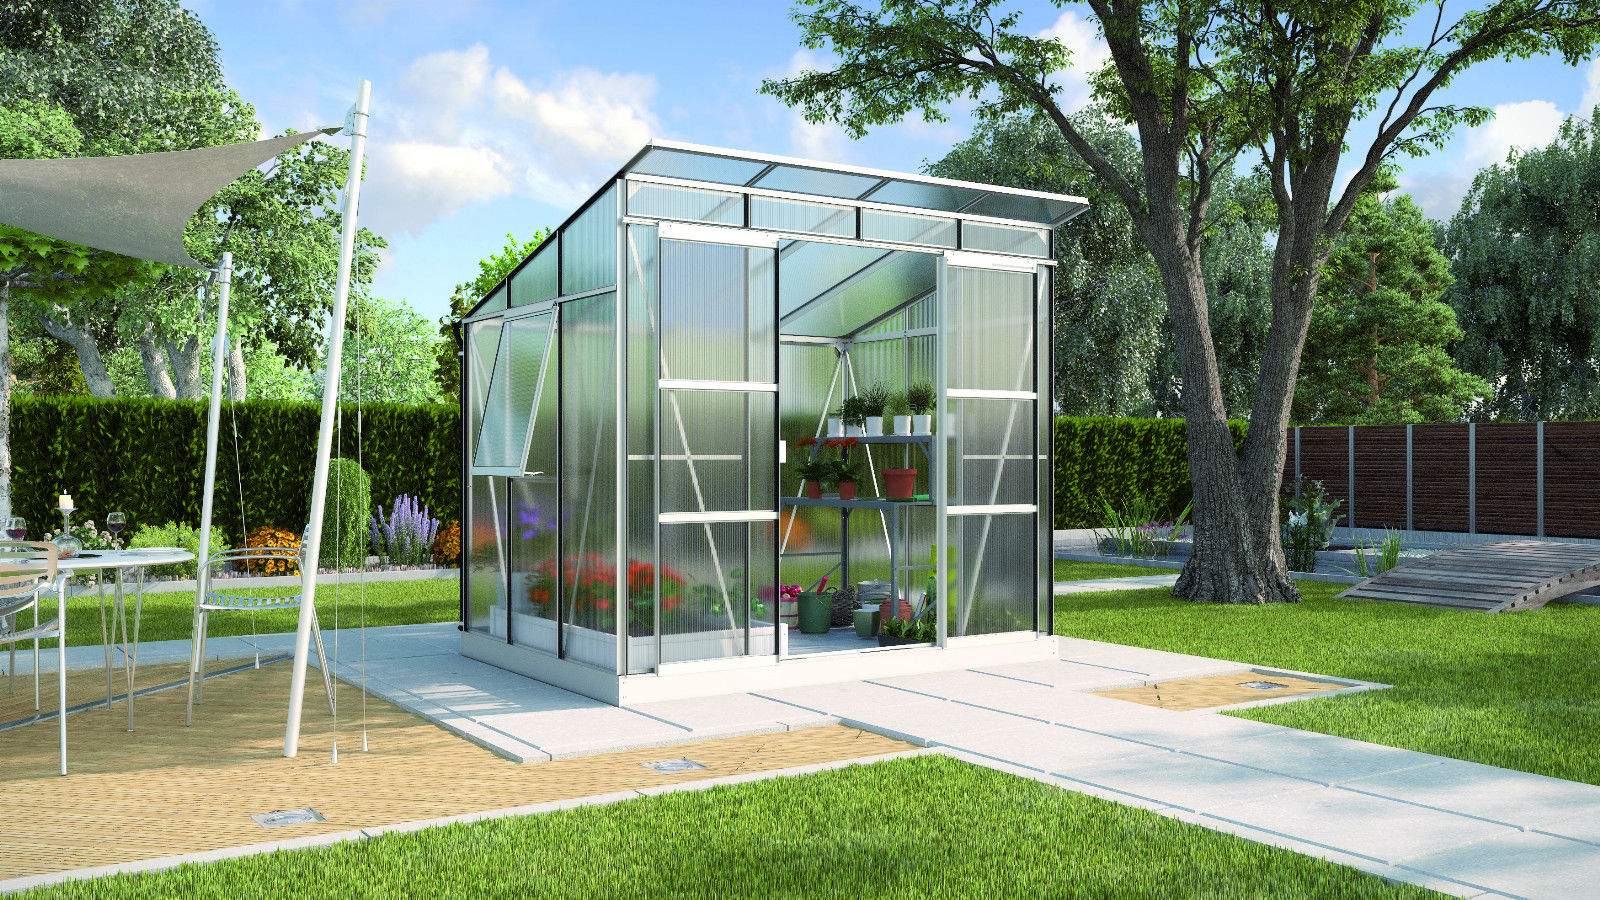 vitavia gew chshaus freya 5900 5 9m oder freya 7600 7 6m hkp 6mm alu balkon garten shop. Black Bedroom Furniture Sets. Home Design Ideas